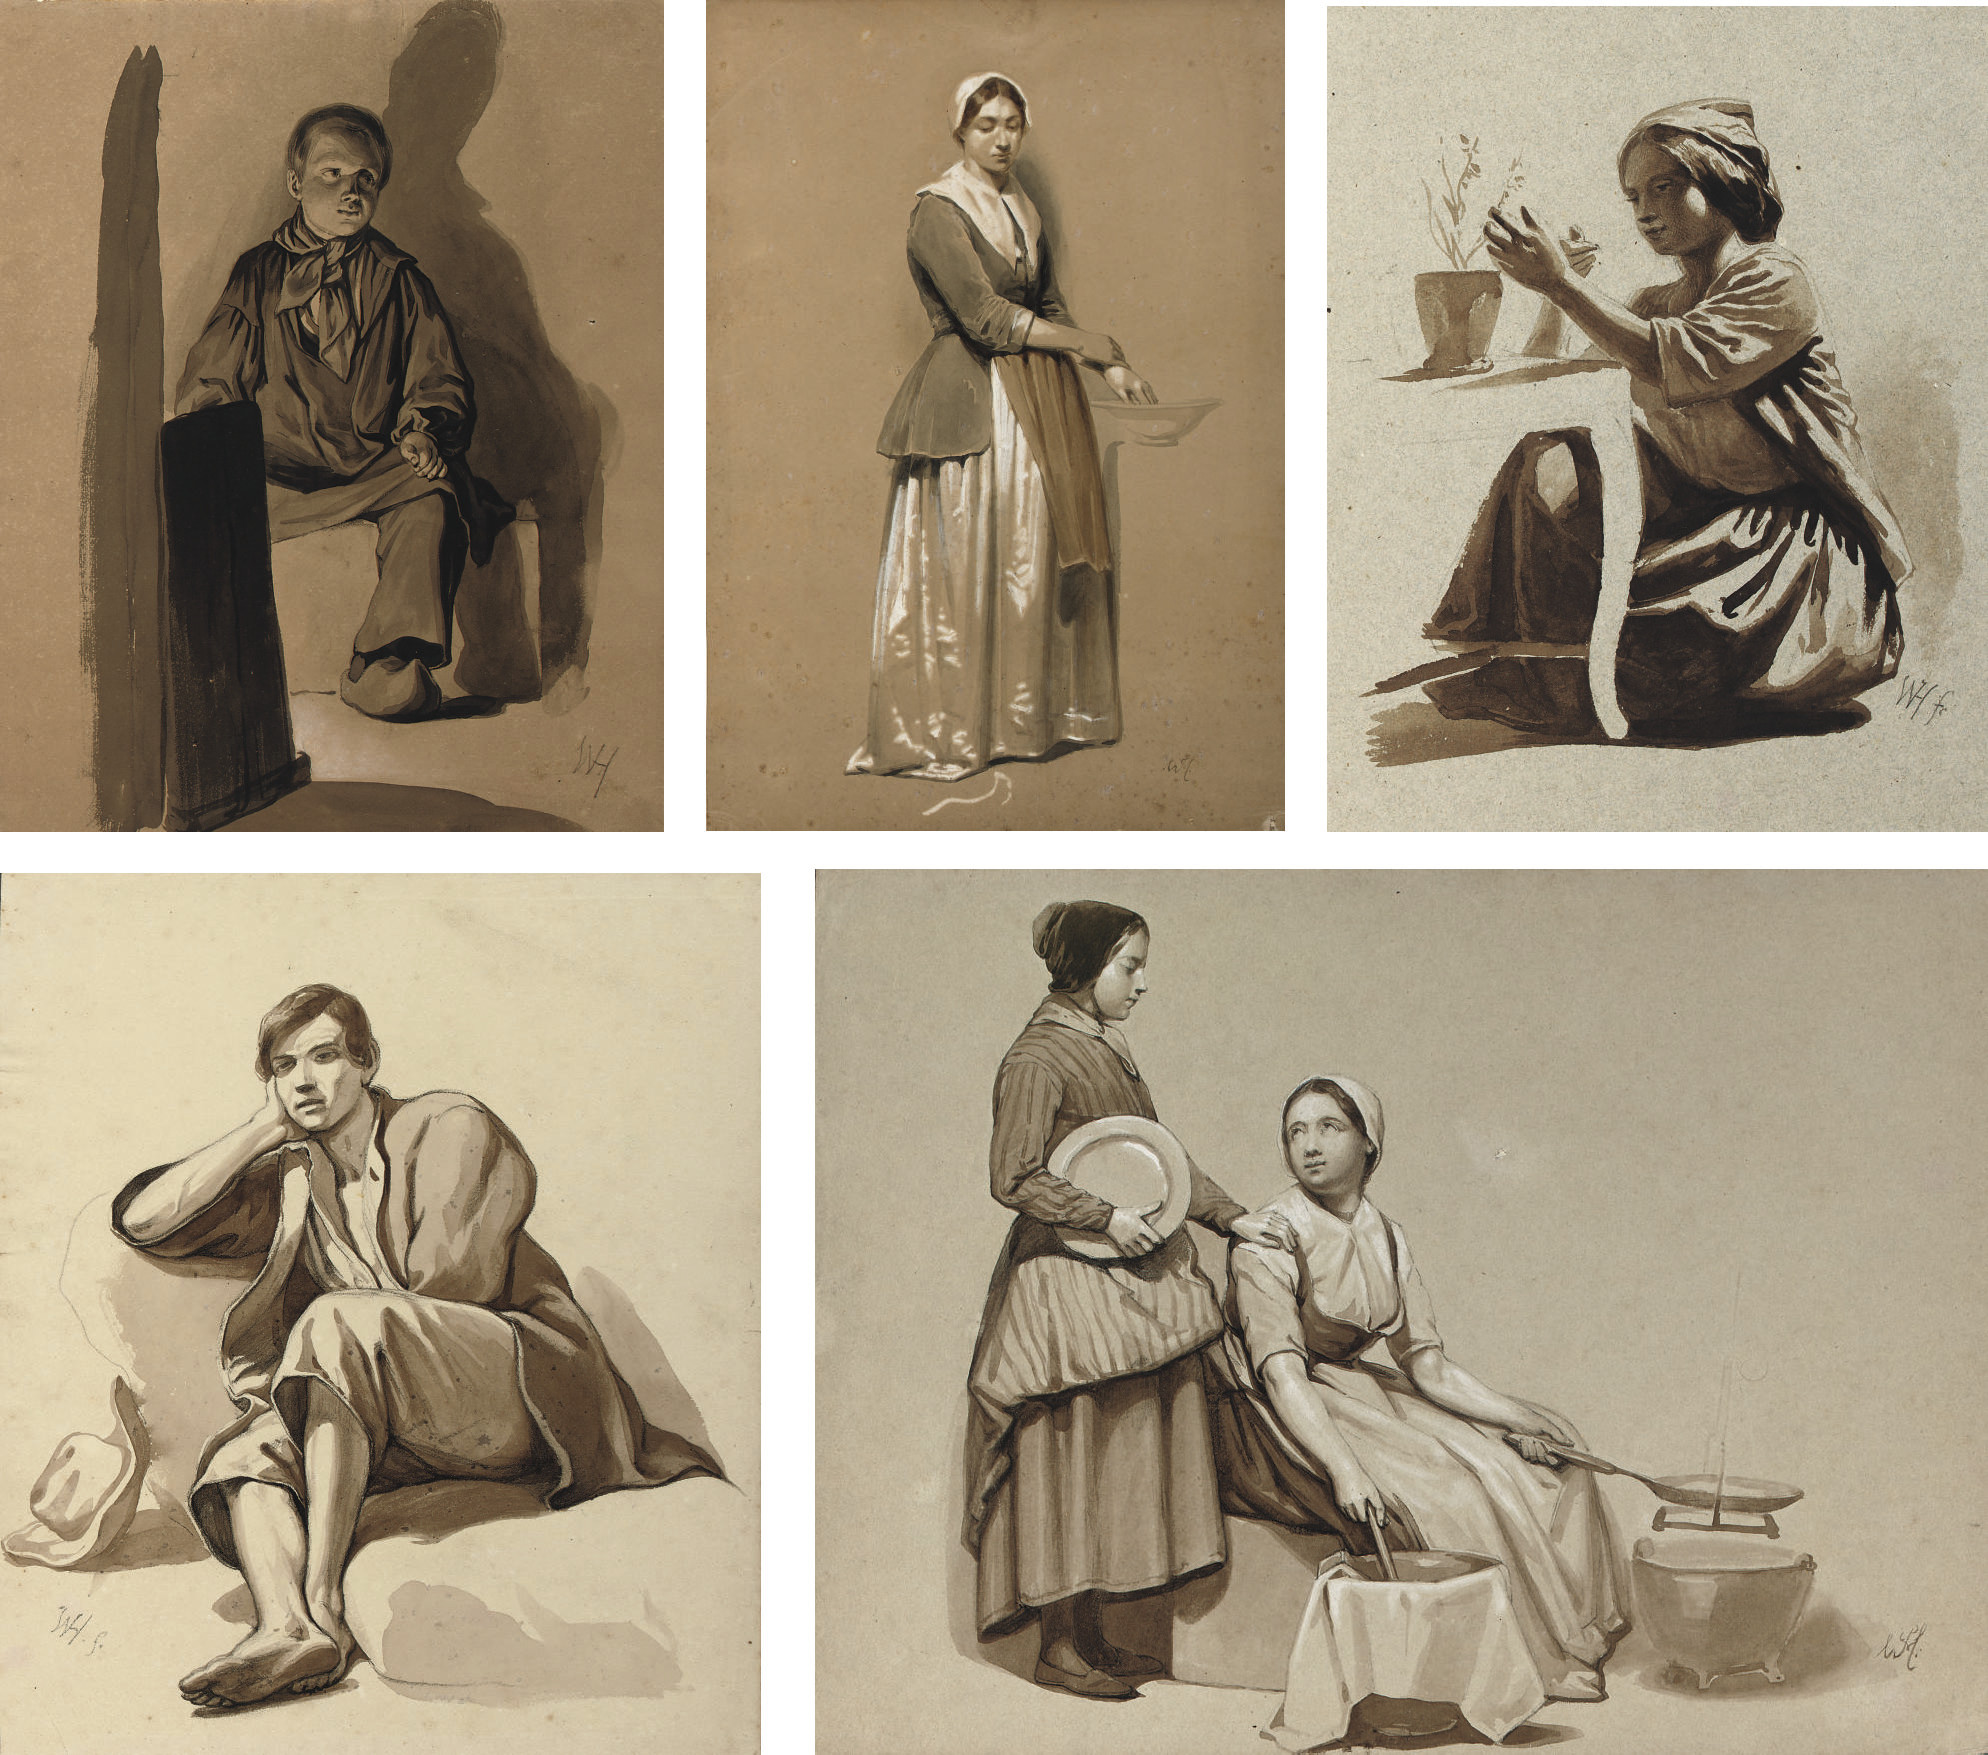 Studies of figures in various positions